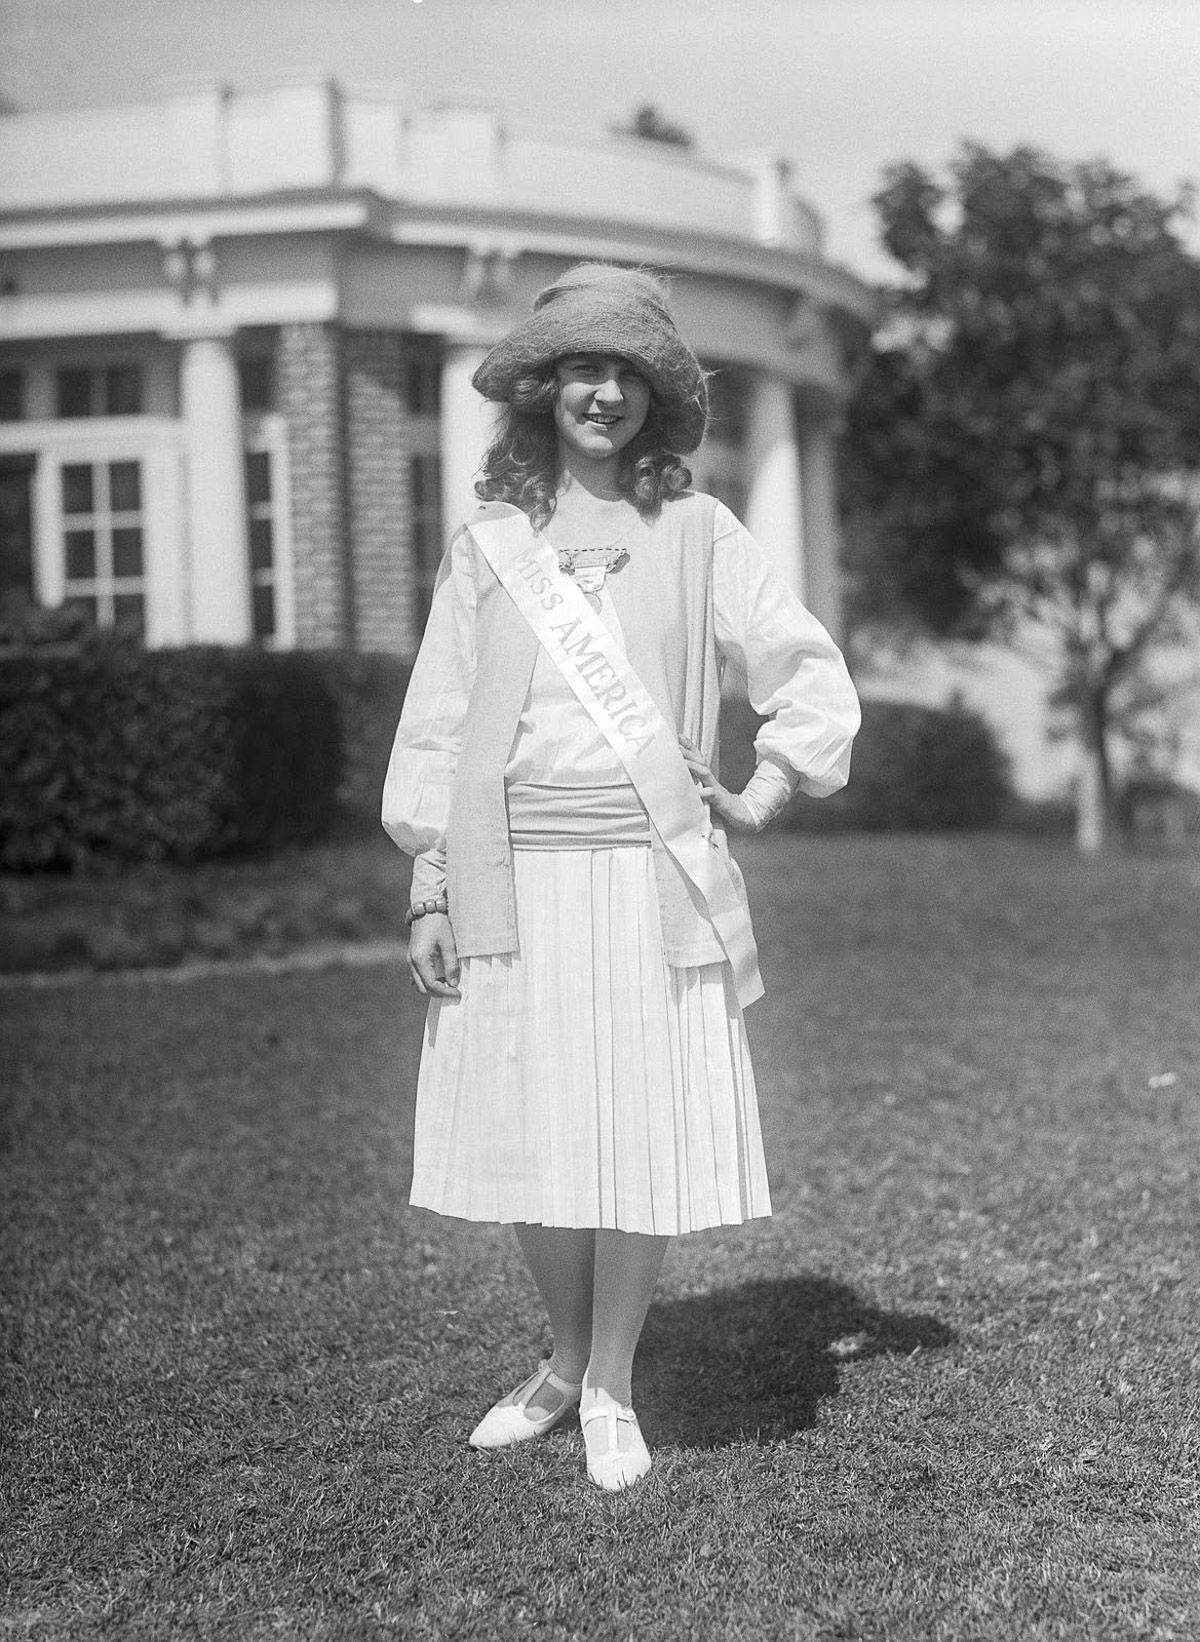 Sept. 7, 1922